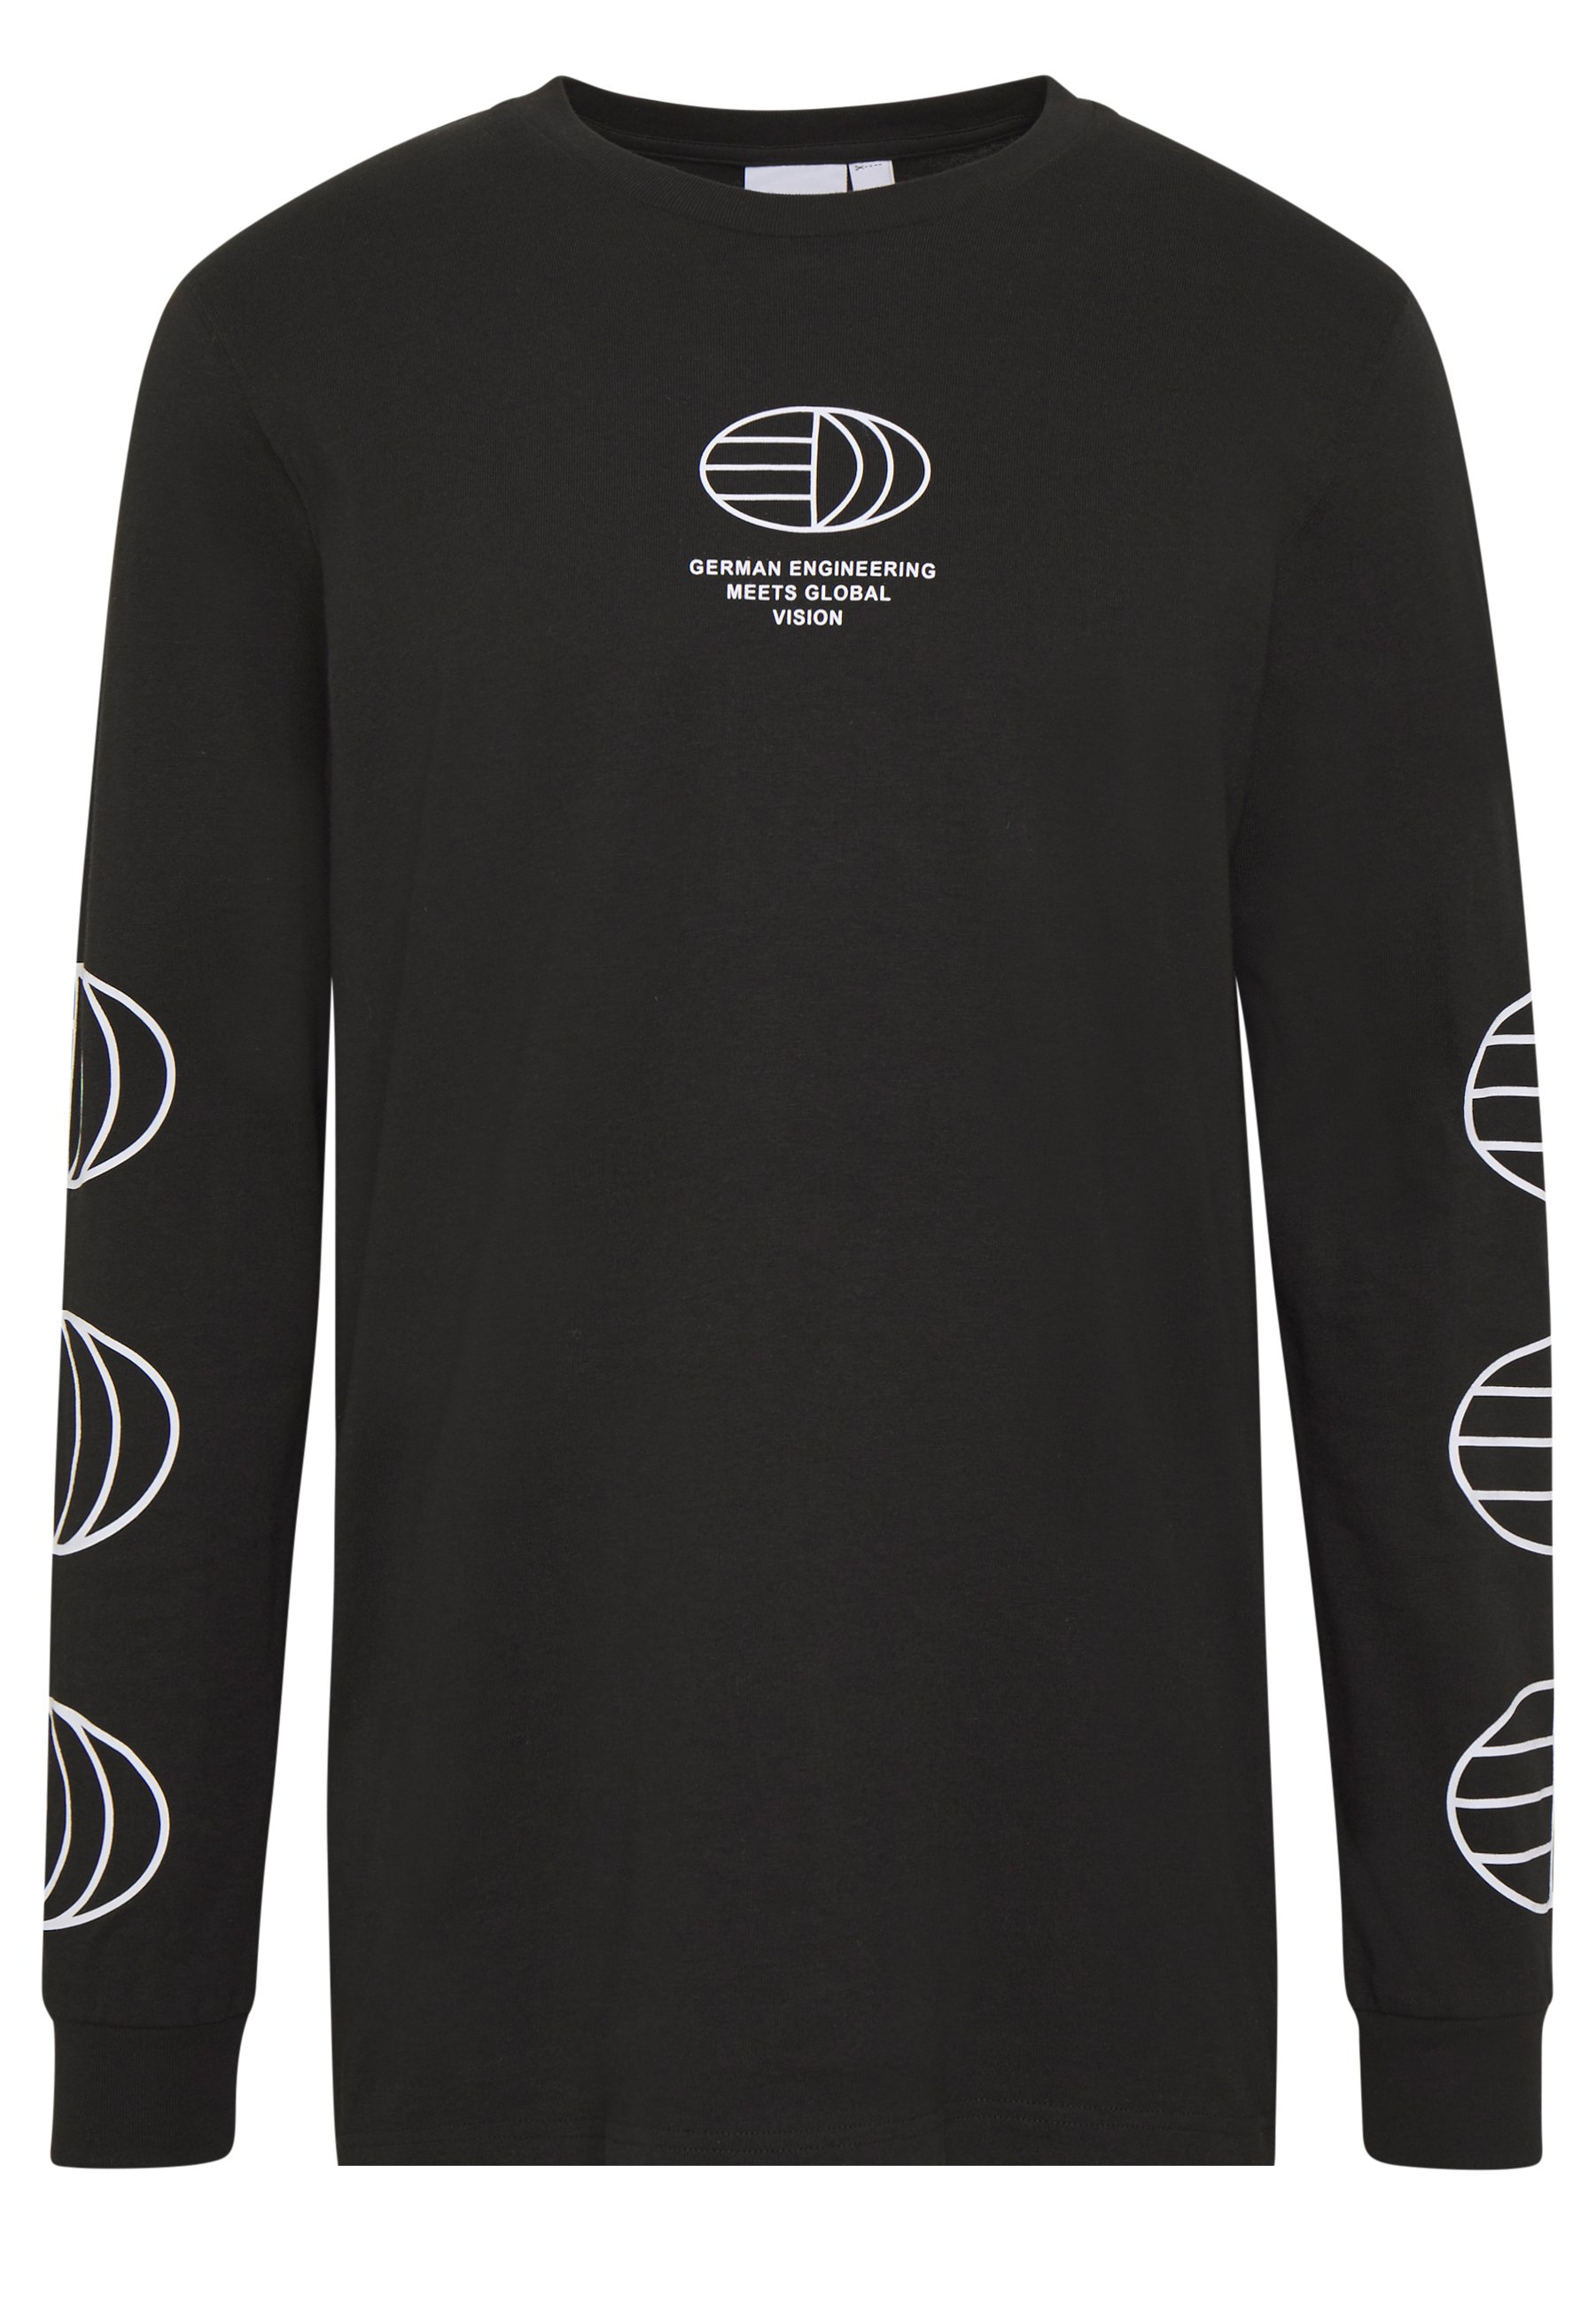 Adidas Originals Graphics Graphic Tee Long Sleeve T-shirt - Bluzka Z Długim Rękawem Black